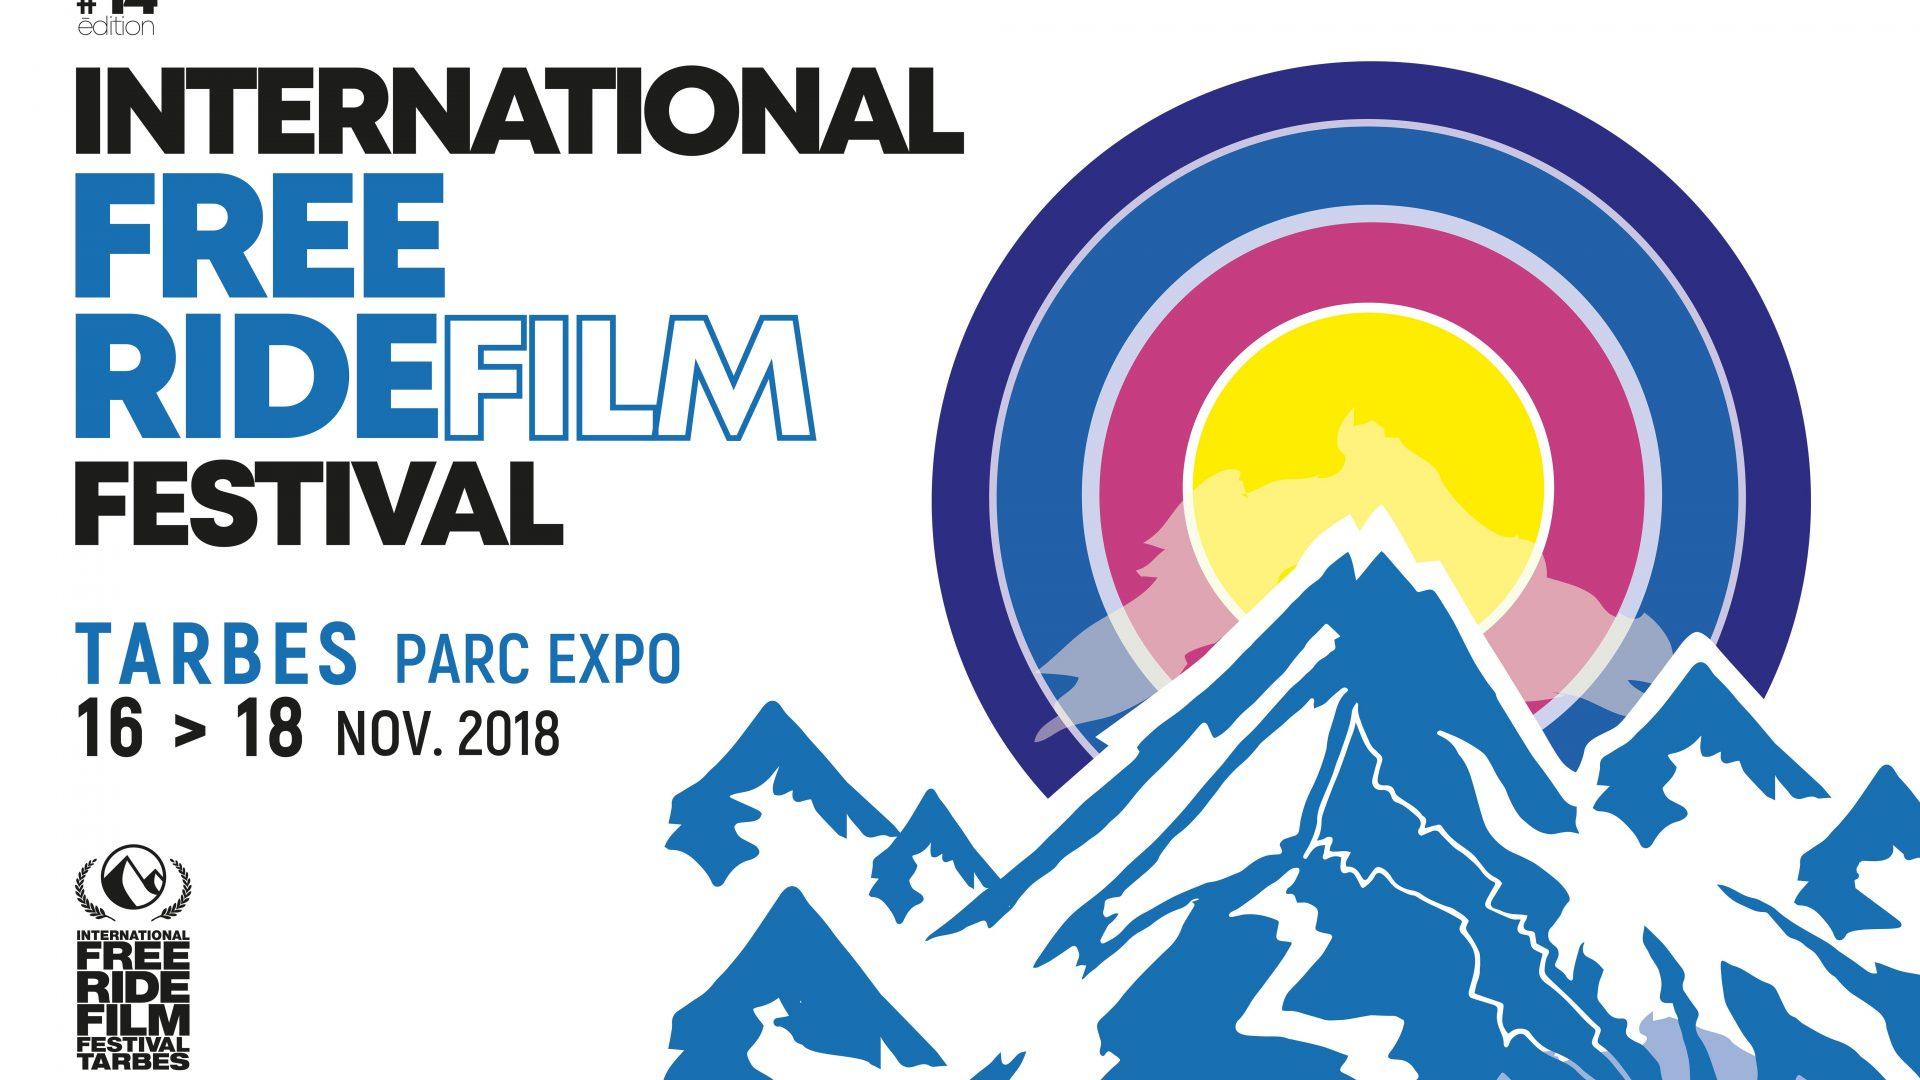 International Free Ride Film Festival